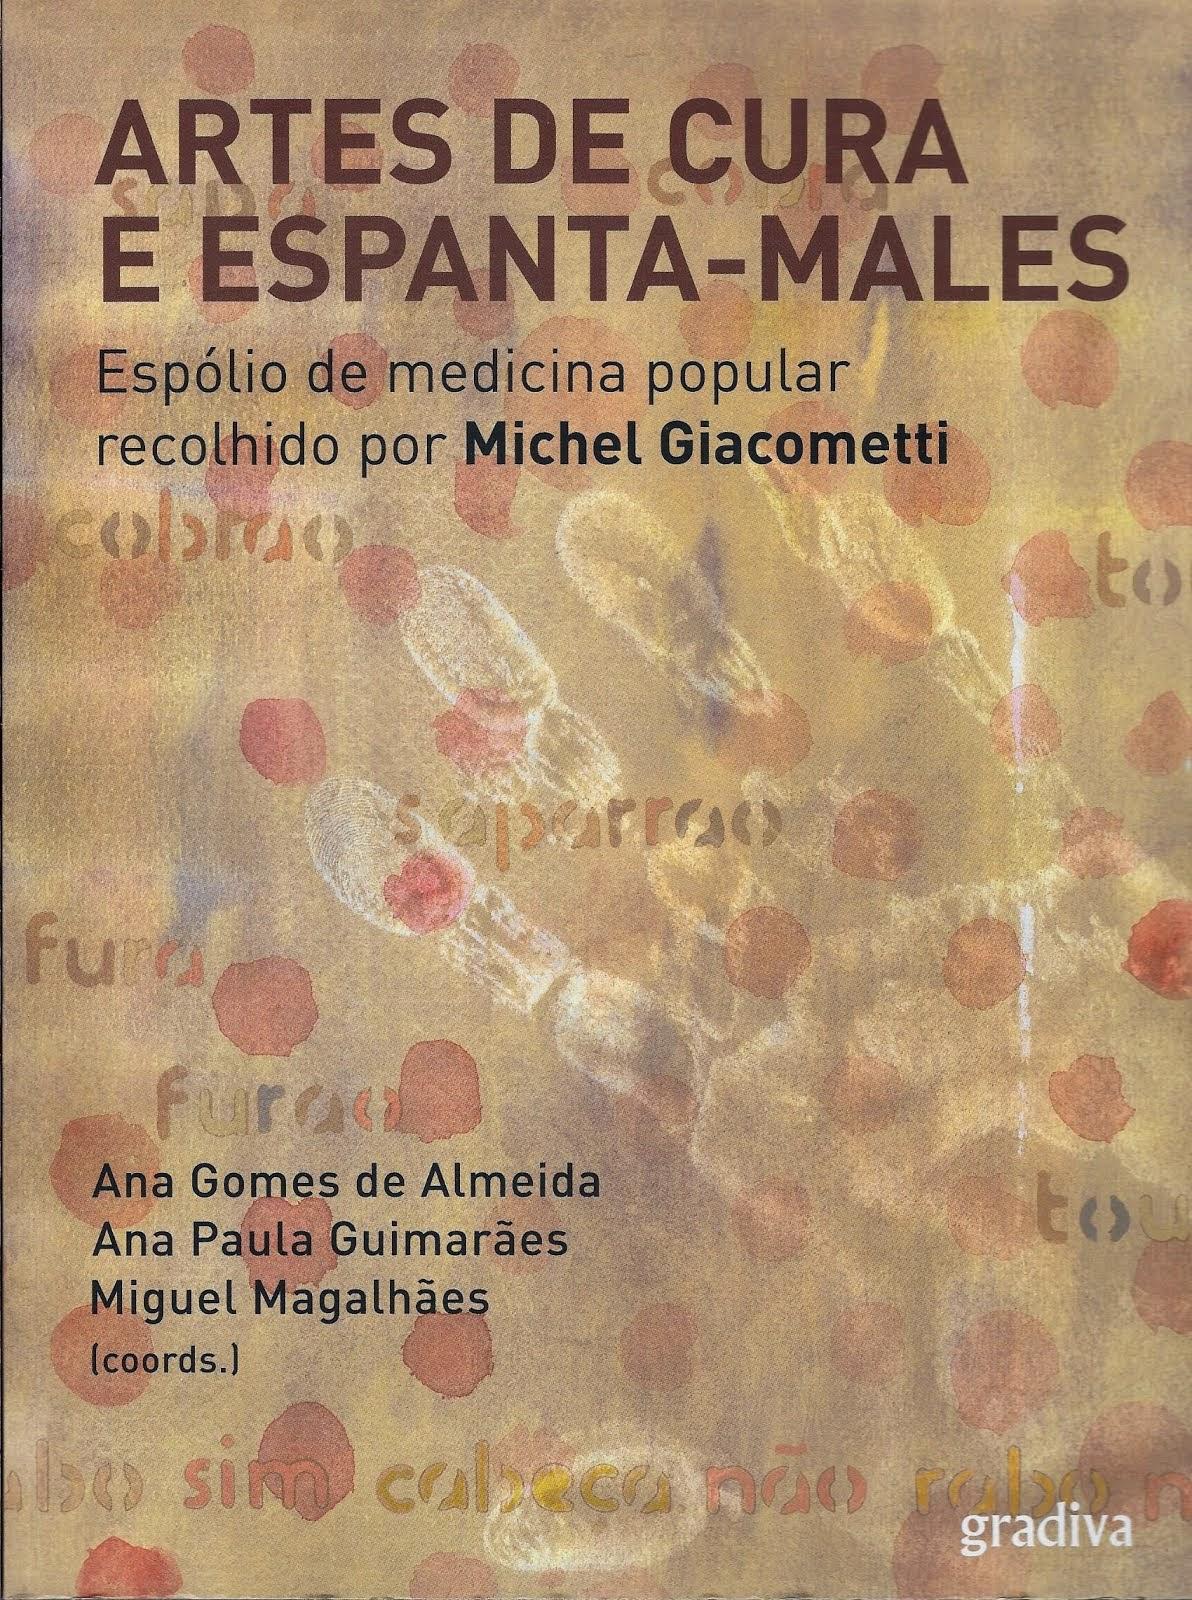 Artes de Cura e Espanta-Males – Espólio de Medicina Popular recolhido por Michel Giacometti